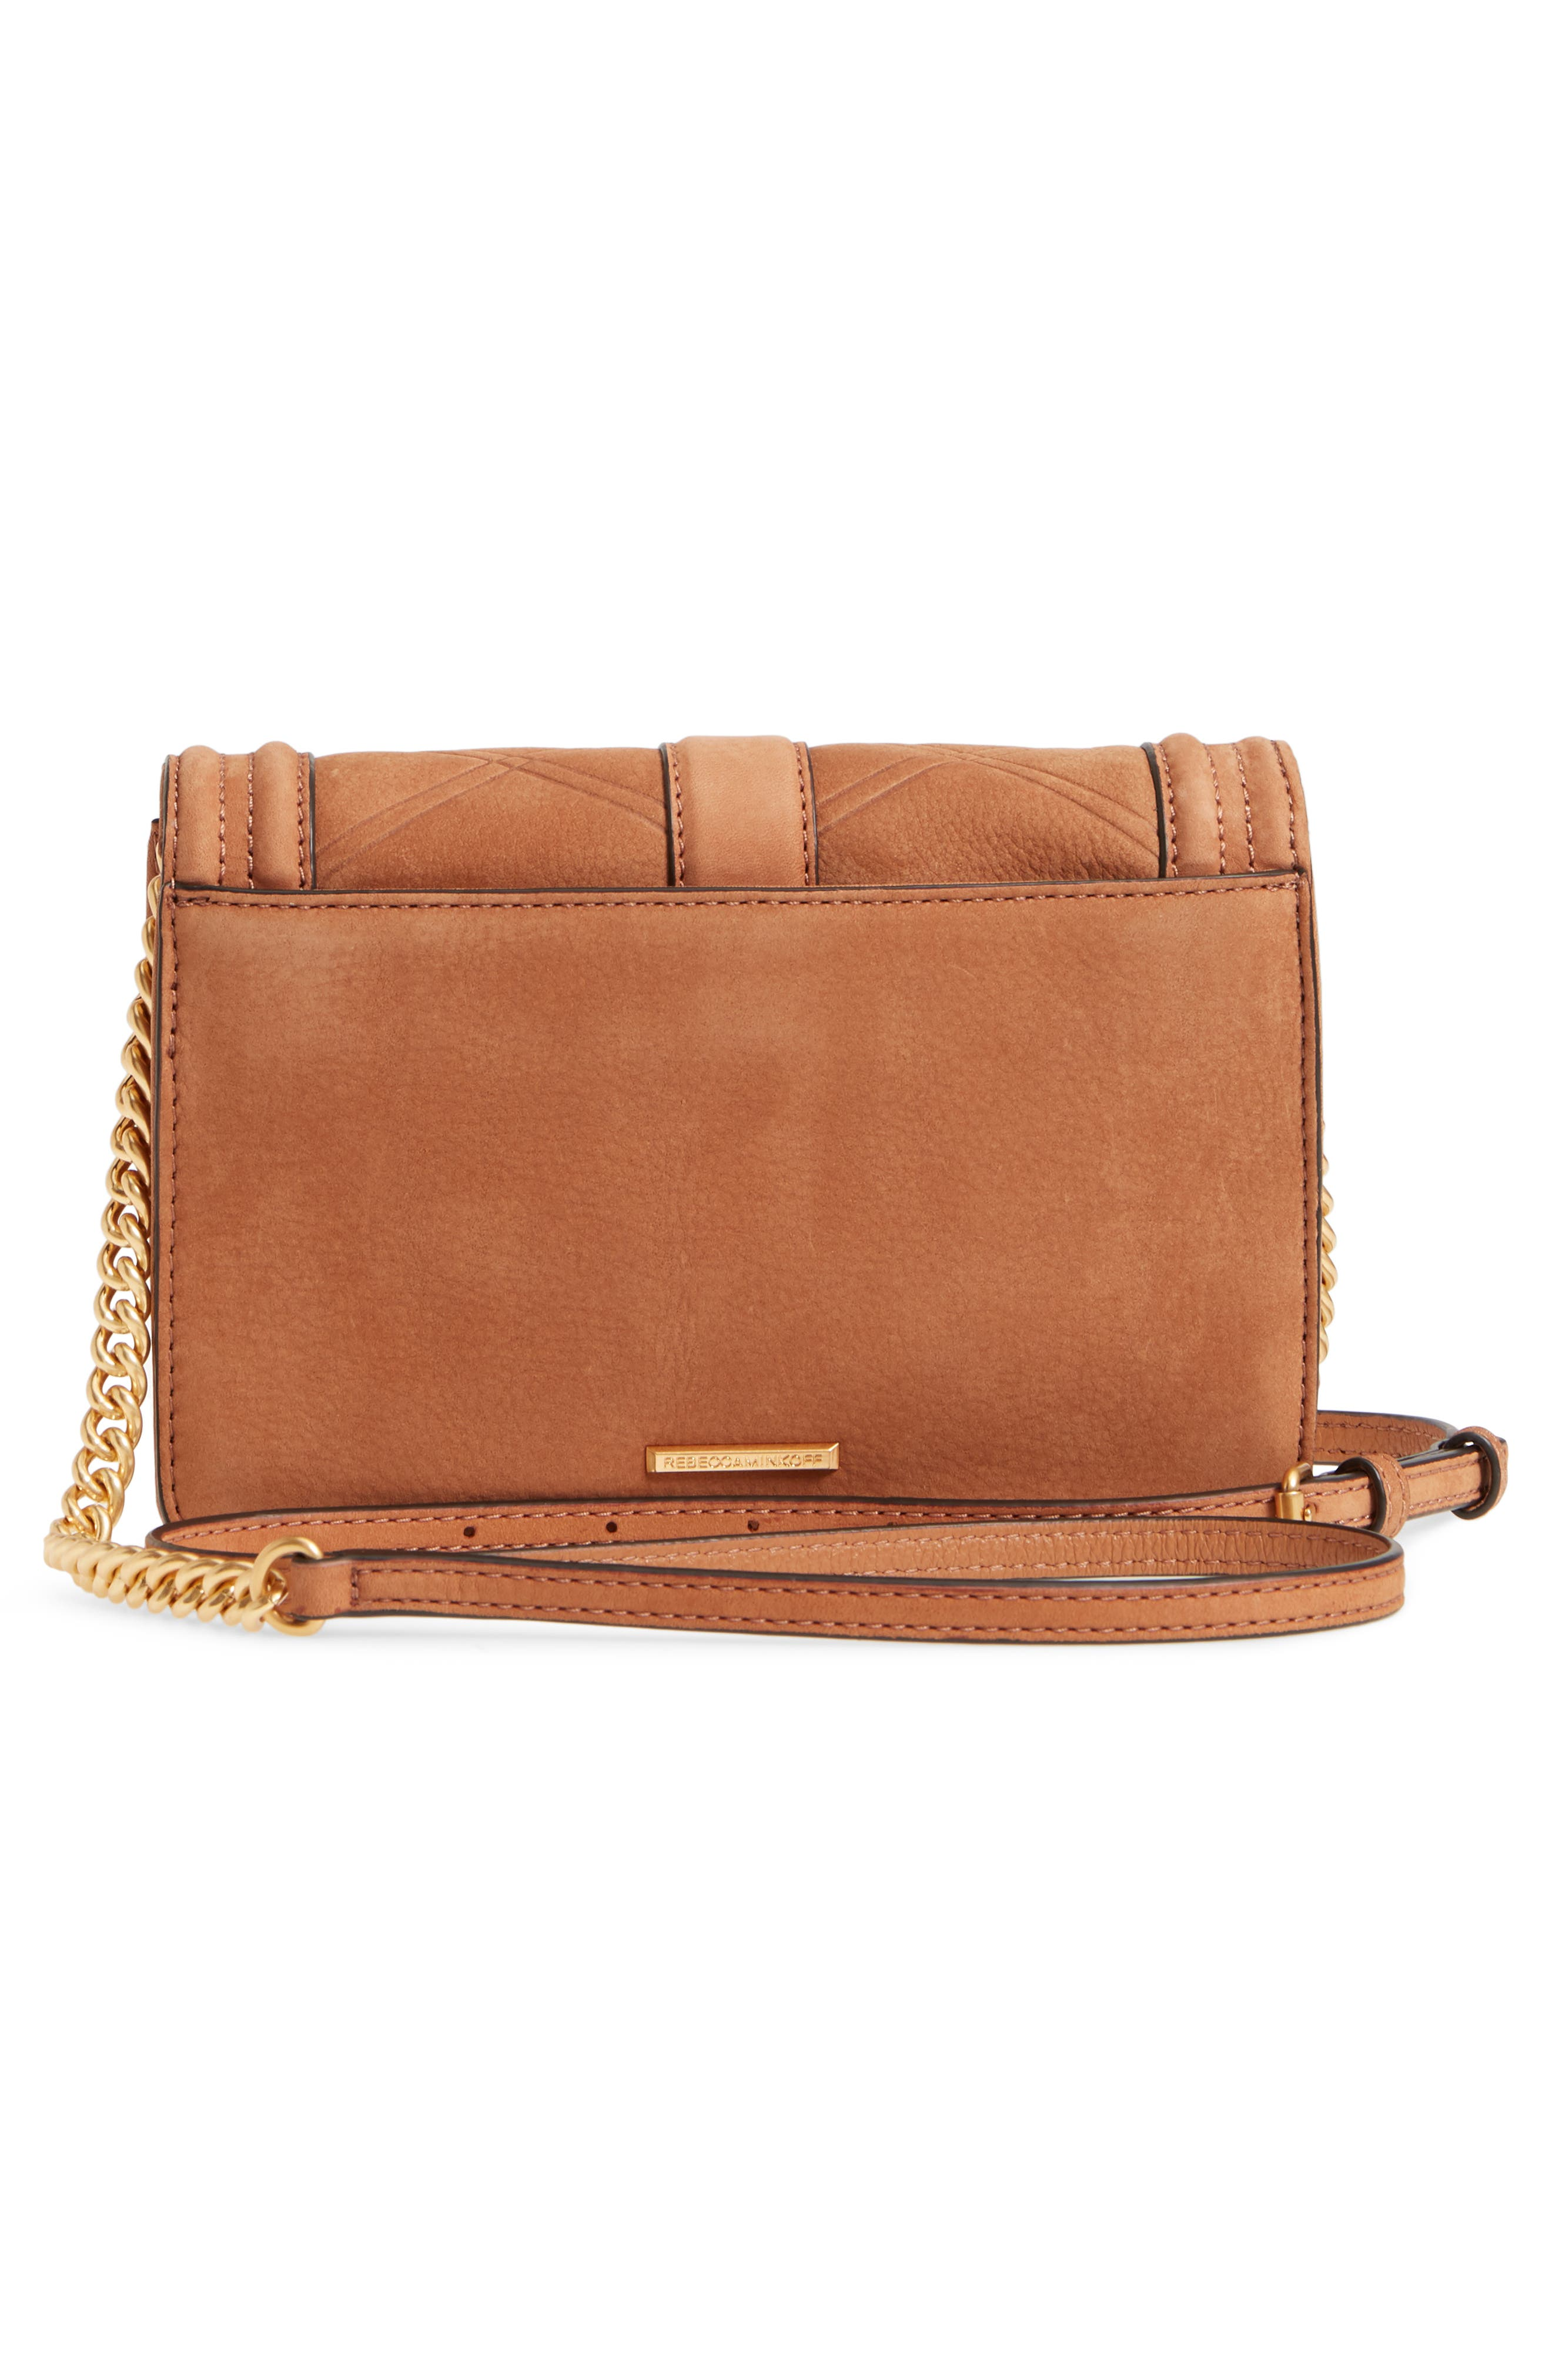 Small Love Nubuck Leather Crossbody Bag,                             Alternate thumbnail 3, color,                             Almond